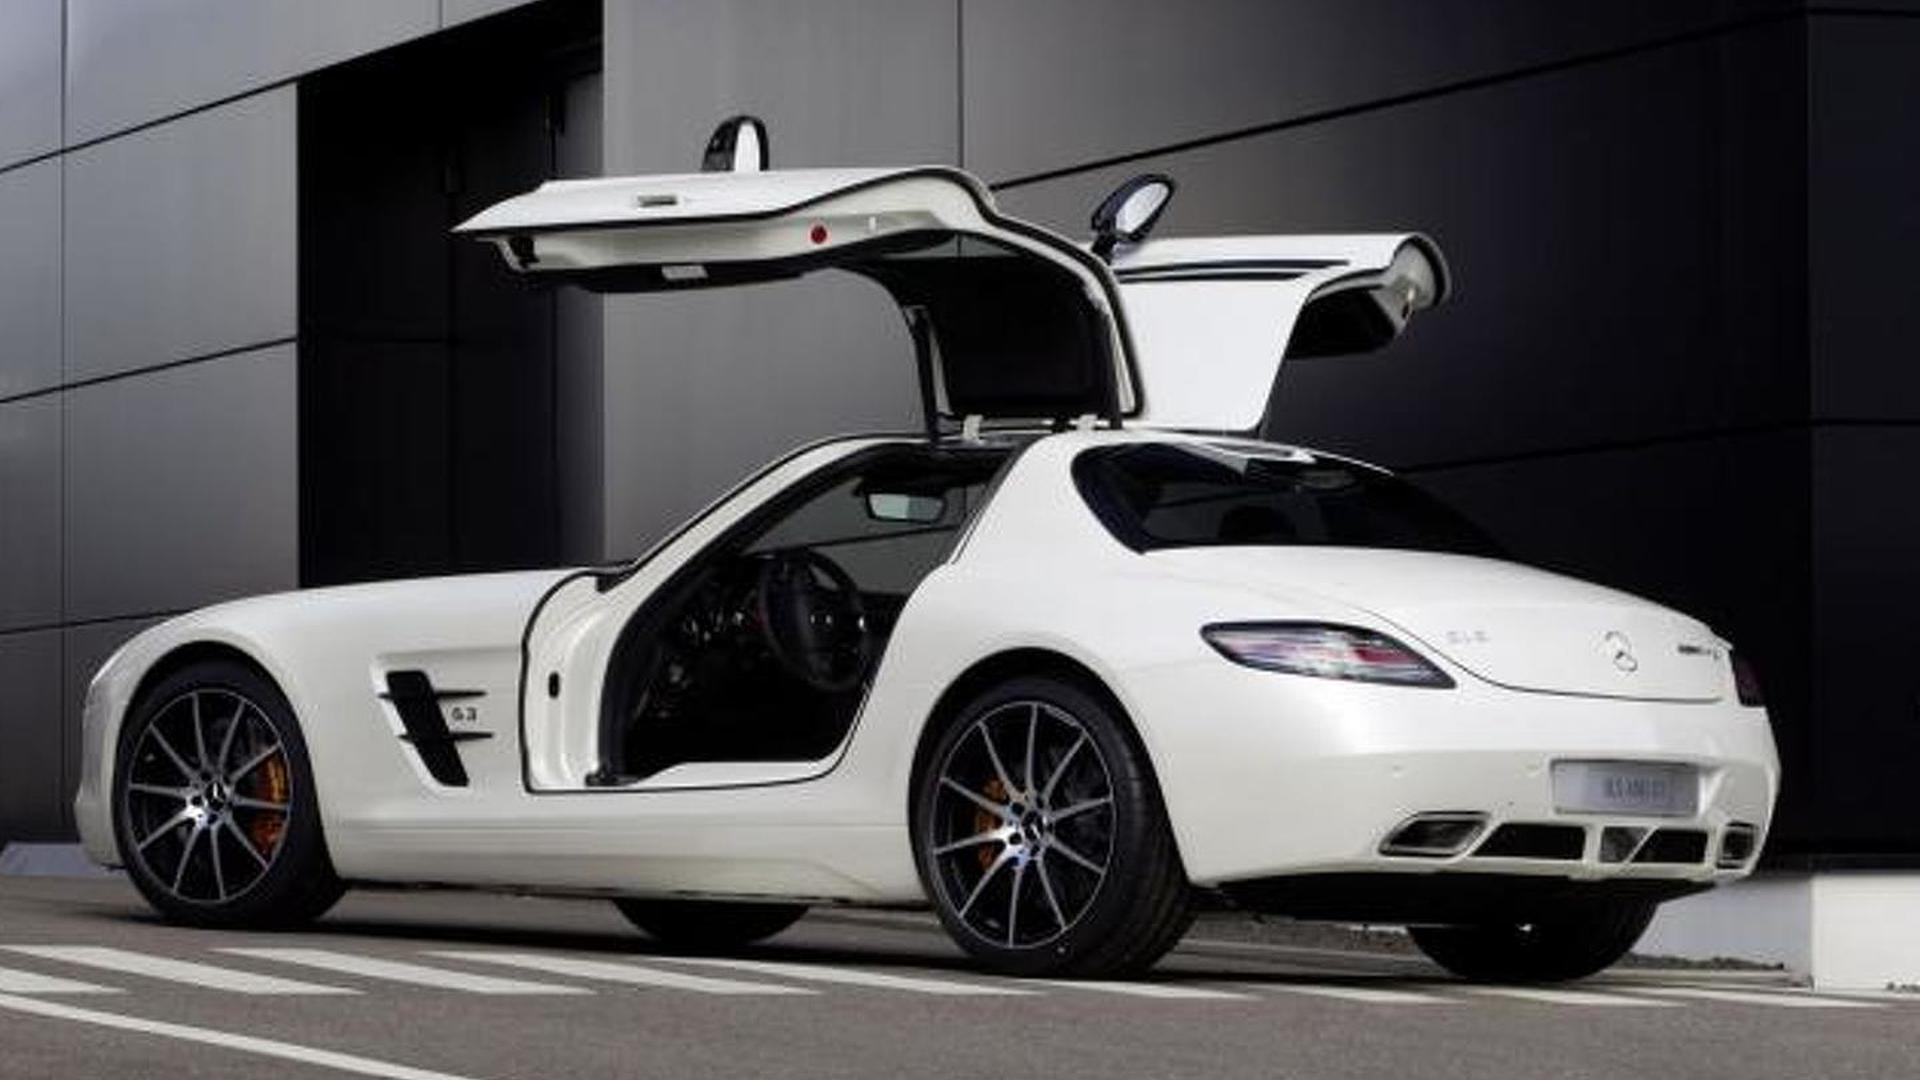 Mercedes Sls Amg Gt >> 2013 Mercedes Sls Amg Gt Nurburgring Lap Time Is 7 30 Priced For Us